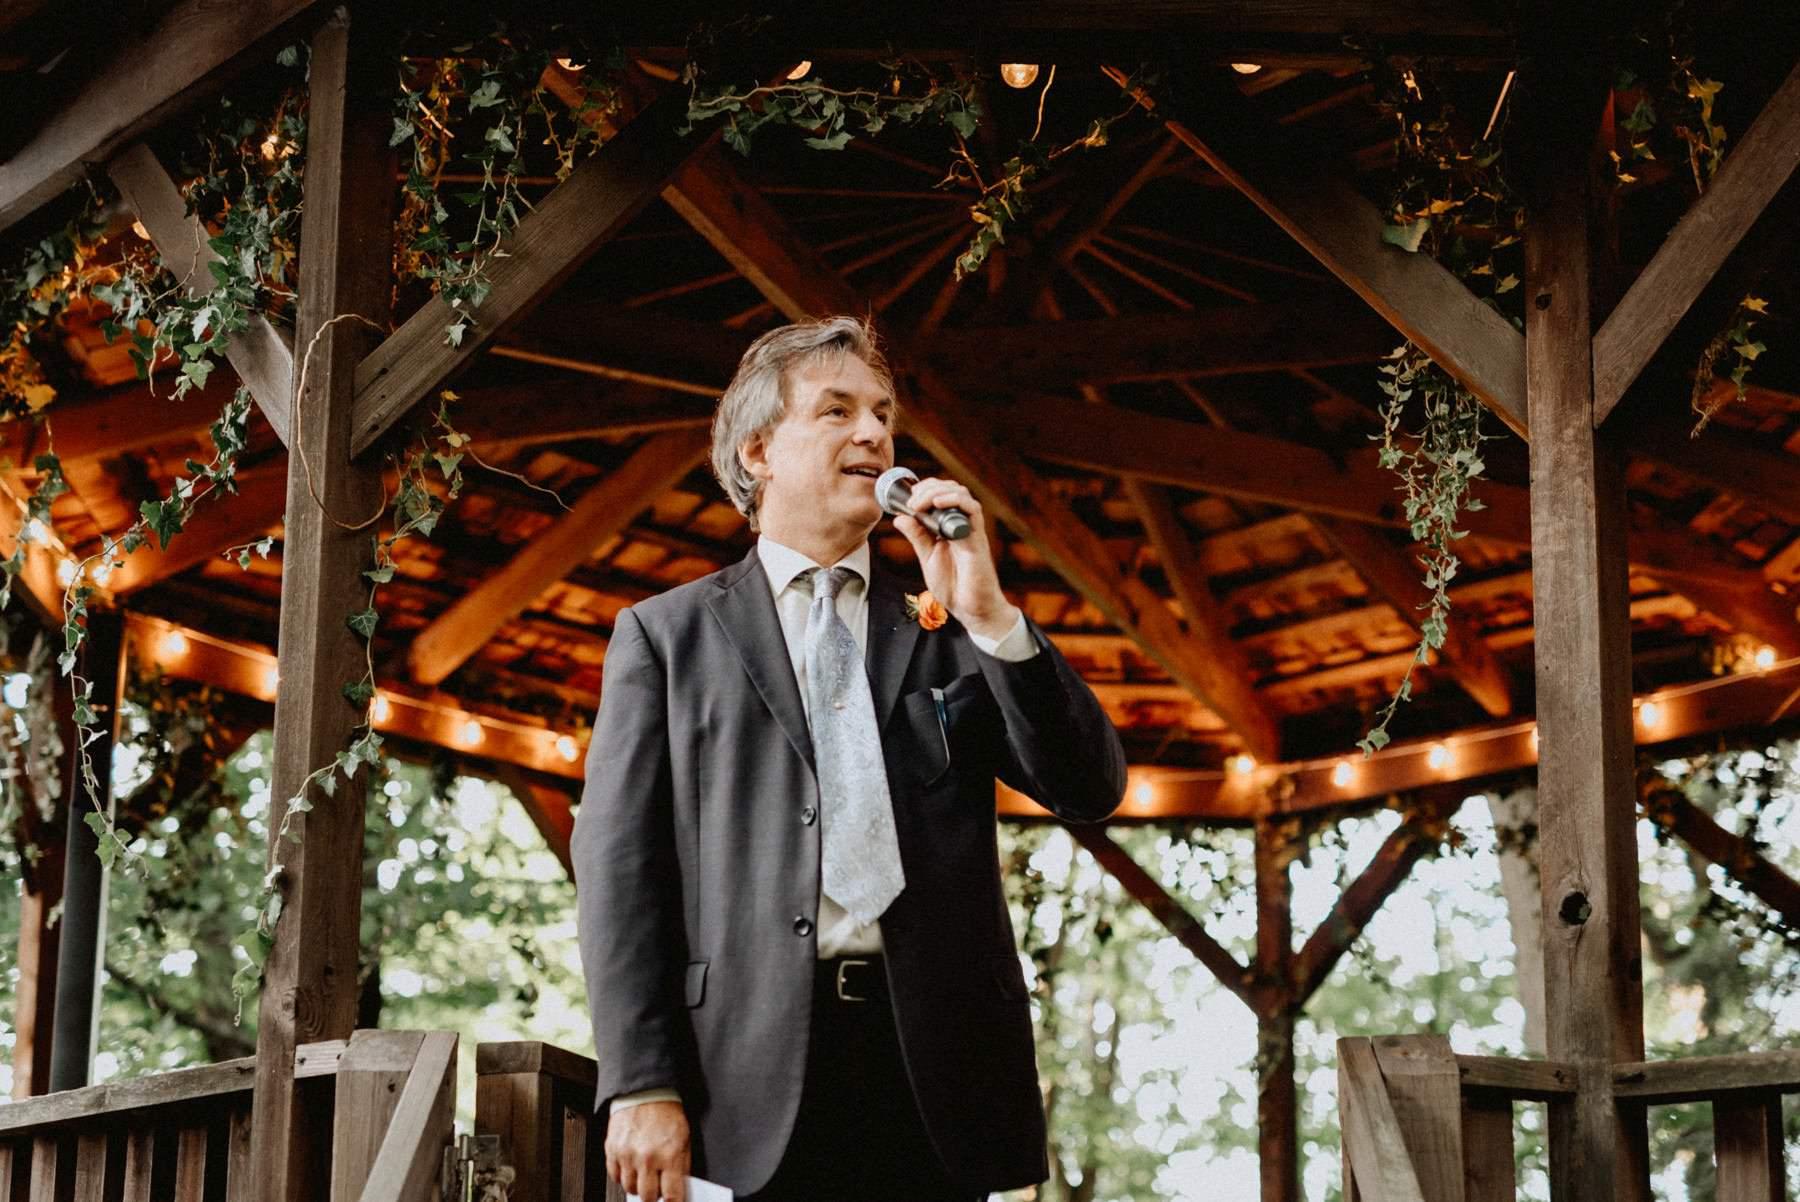 pennsylvania-private-estate-wedding-105.jpg